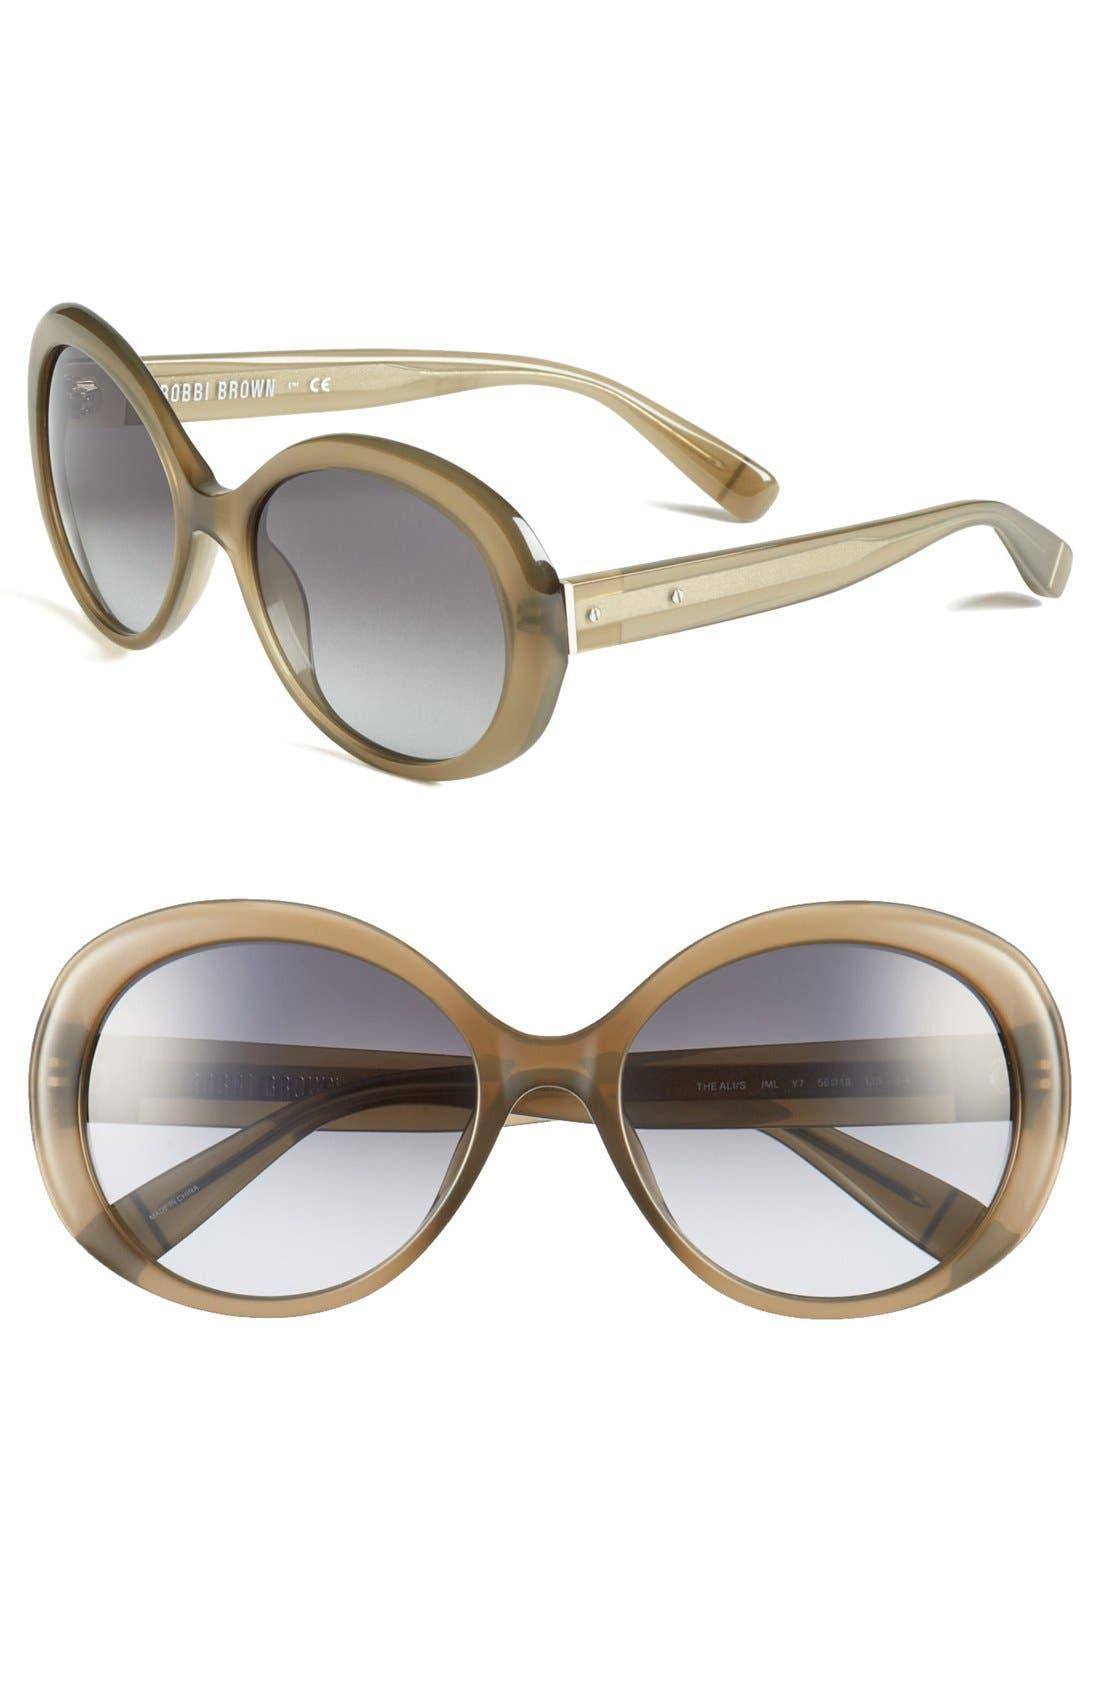 Main Image - Bobbi Brown 'The Ali' 56mm Sunglasses